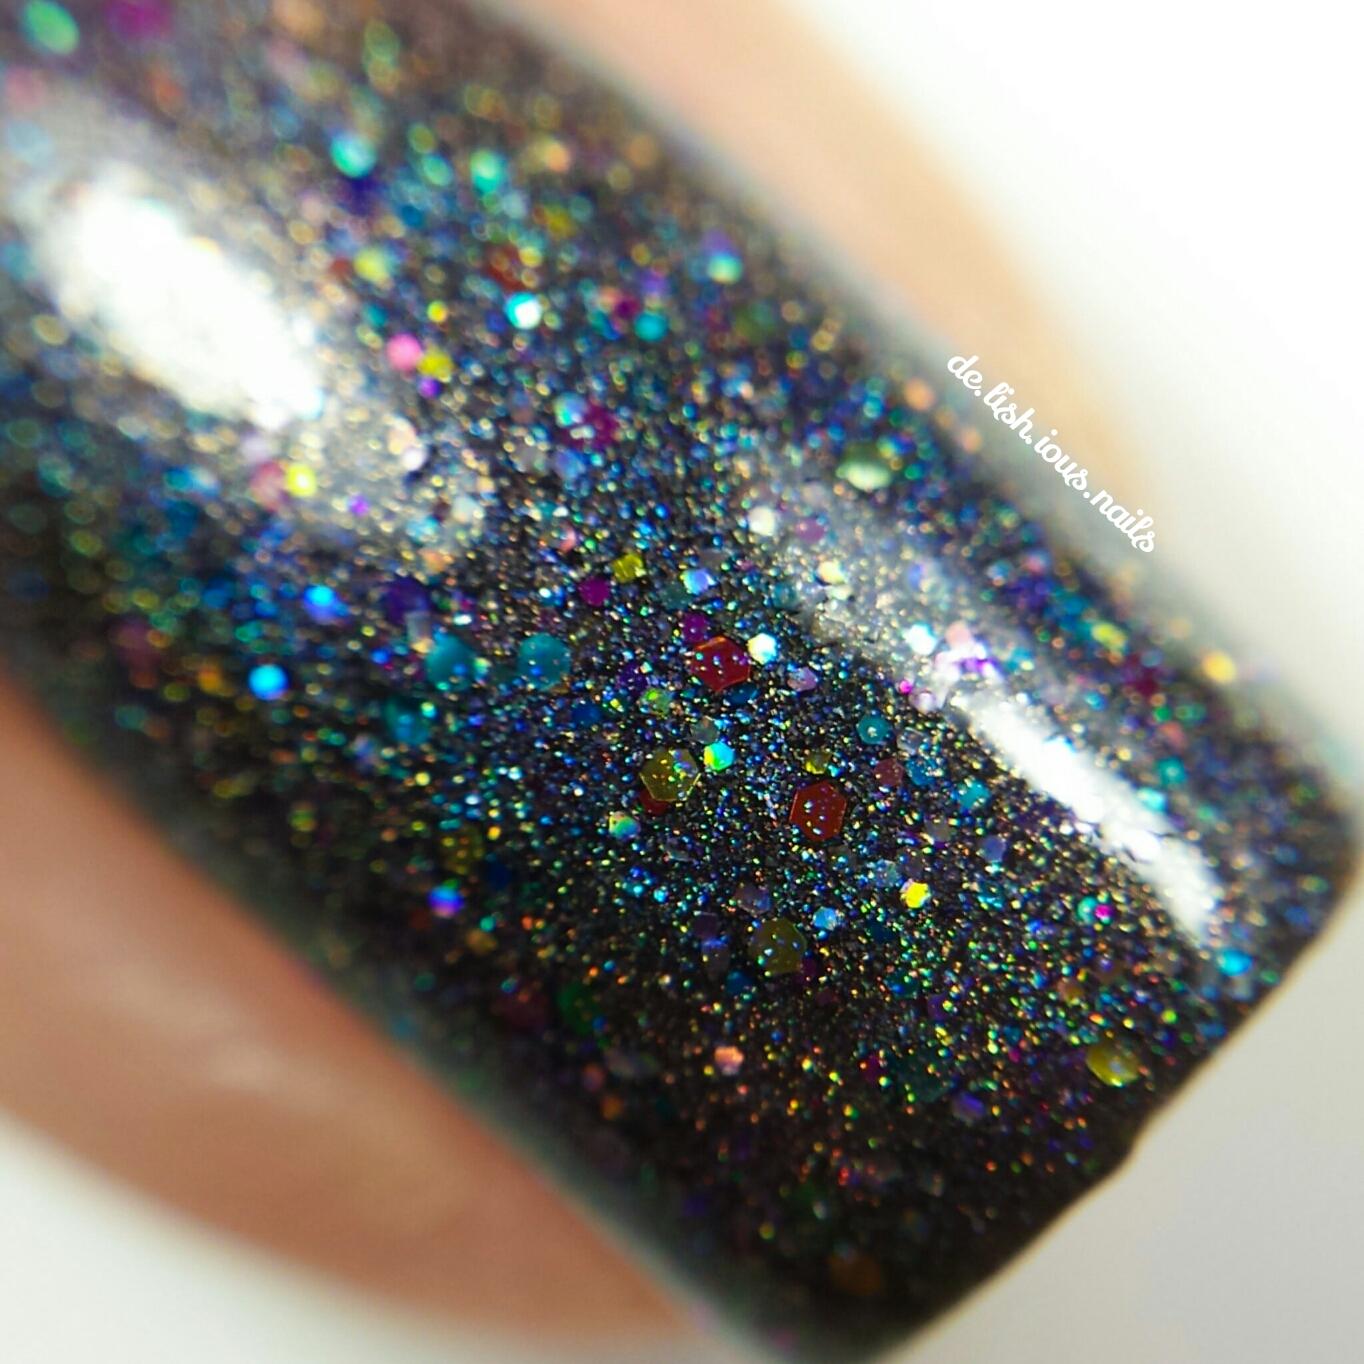 glam-polish-what-exactly-is-she-wearing-4.jpg.jpeg